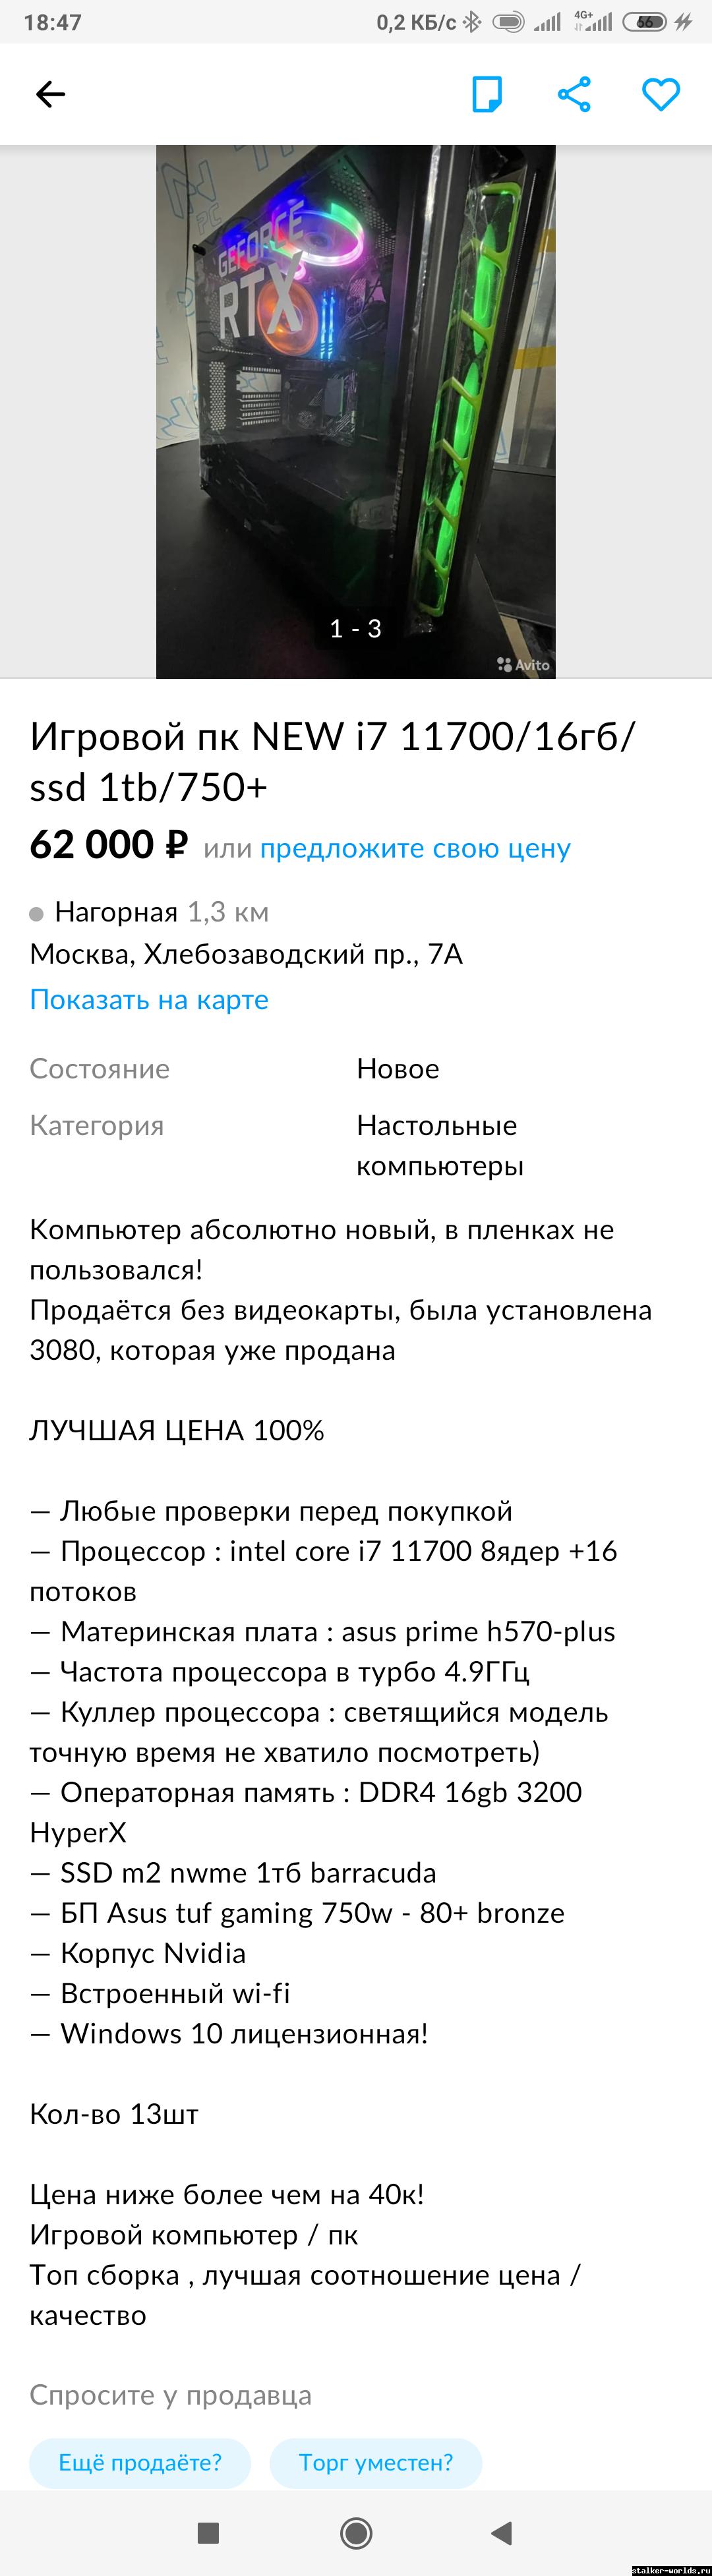 sw_1632412222__screenshot_2021-09-23-18-